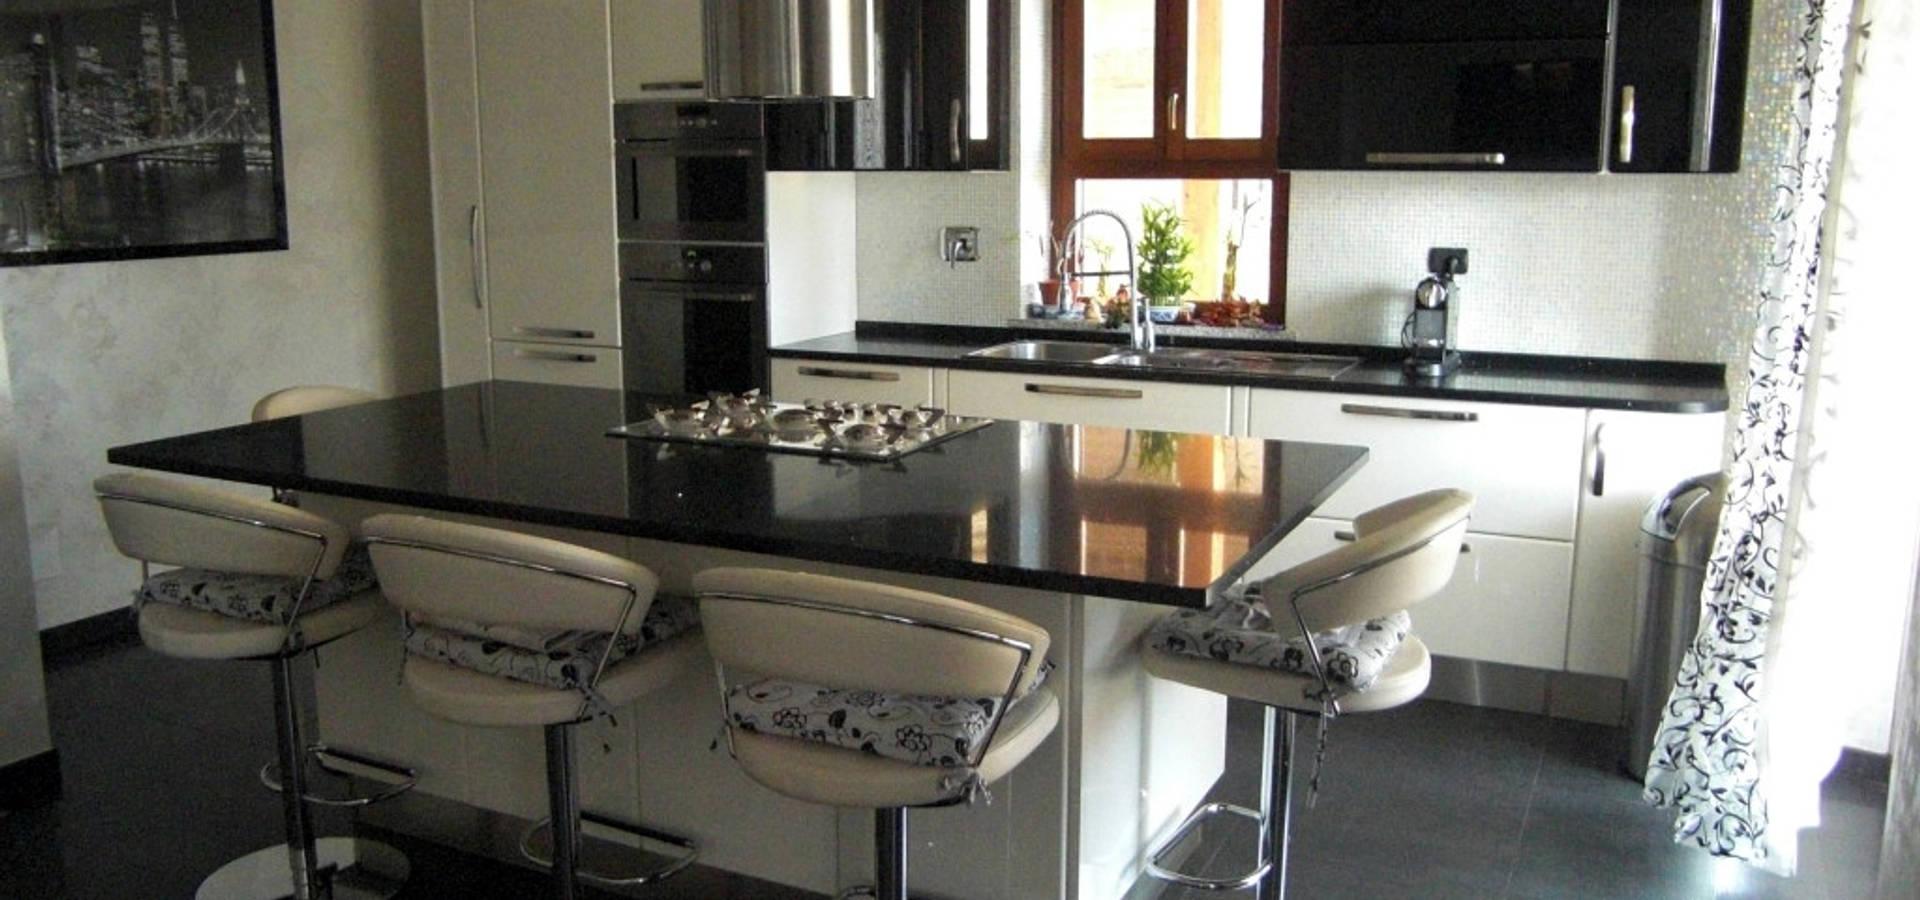 Elles interior design home personal shopper interior - Home personal shopper ...